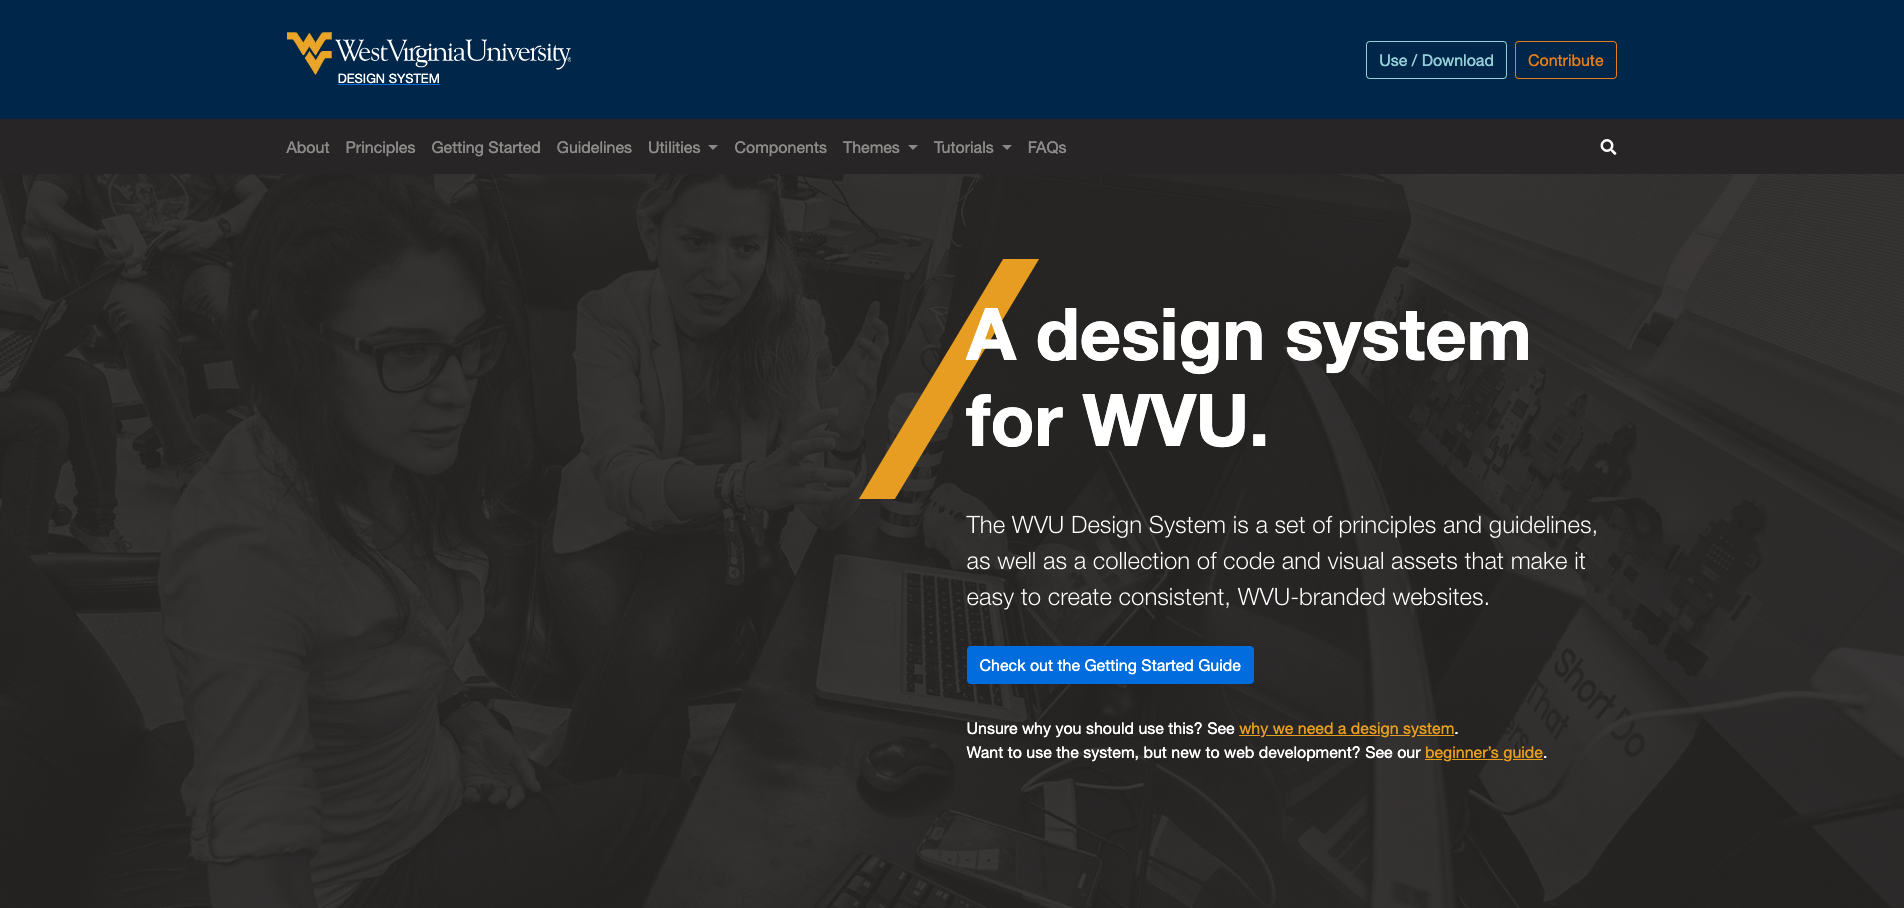 Screenshot of West Virginia University's design system